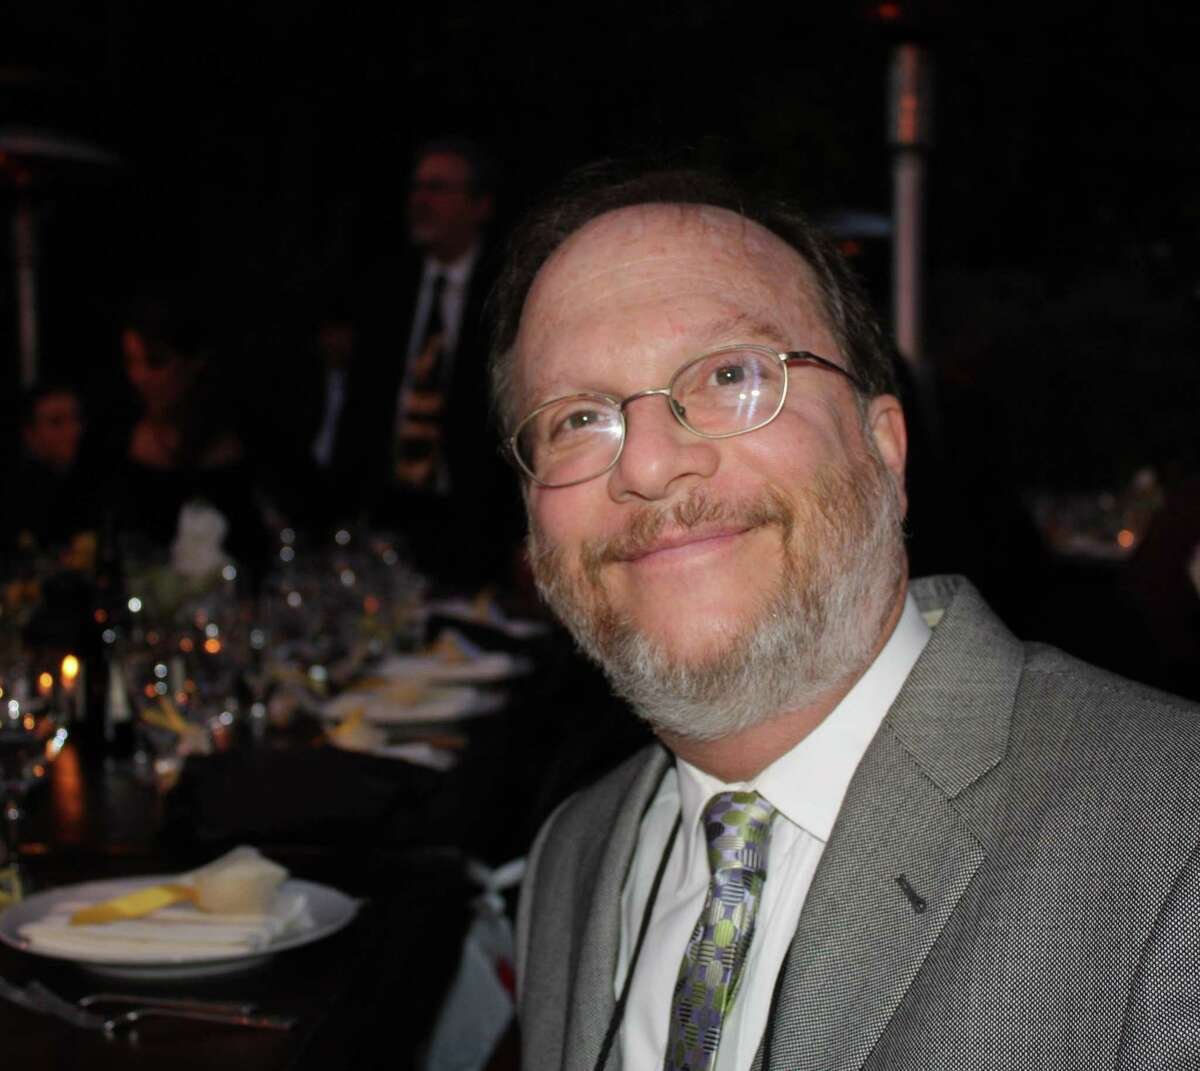 Michael J. London has run the strategic communications firm, Michael J. London & Associates, for more than 30 years.